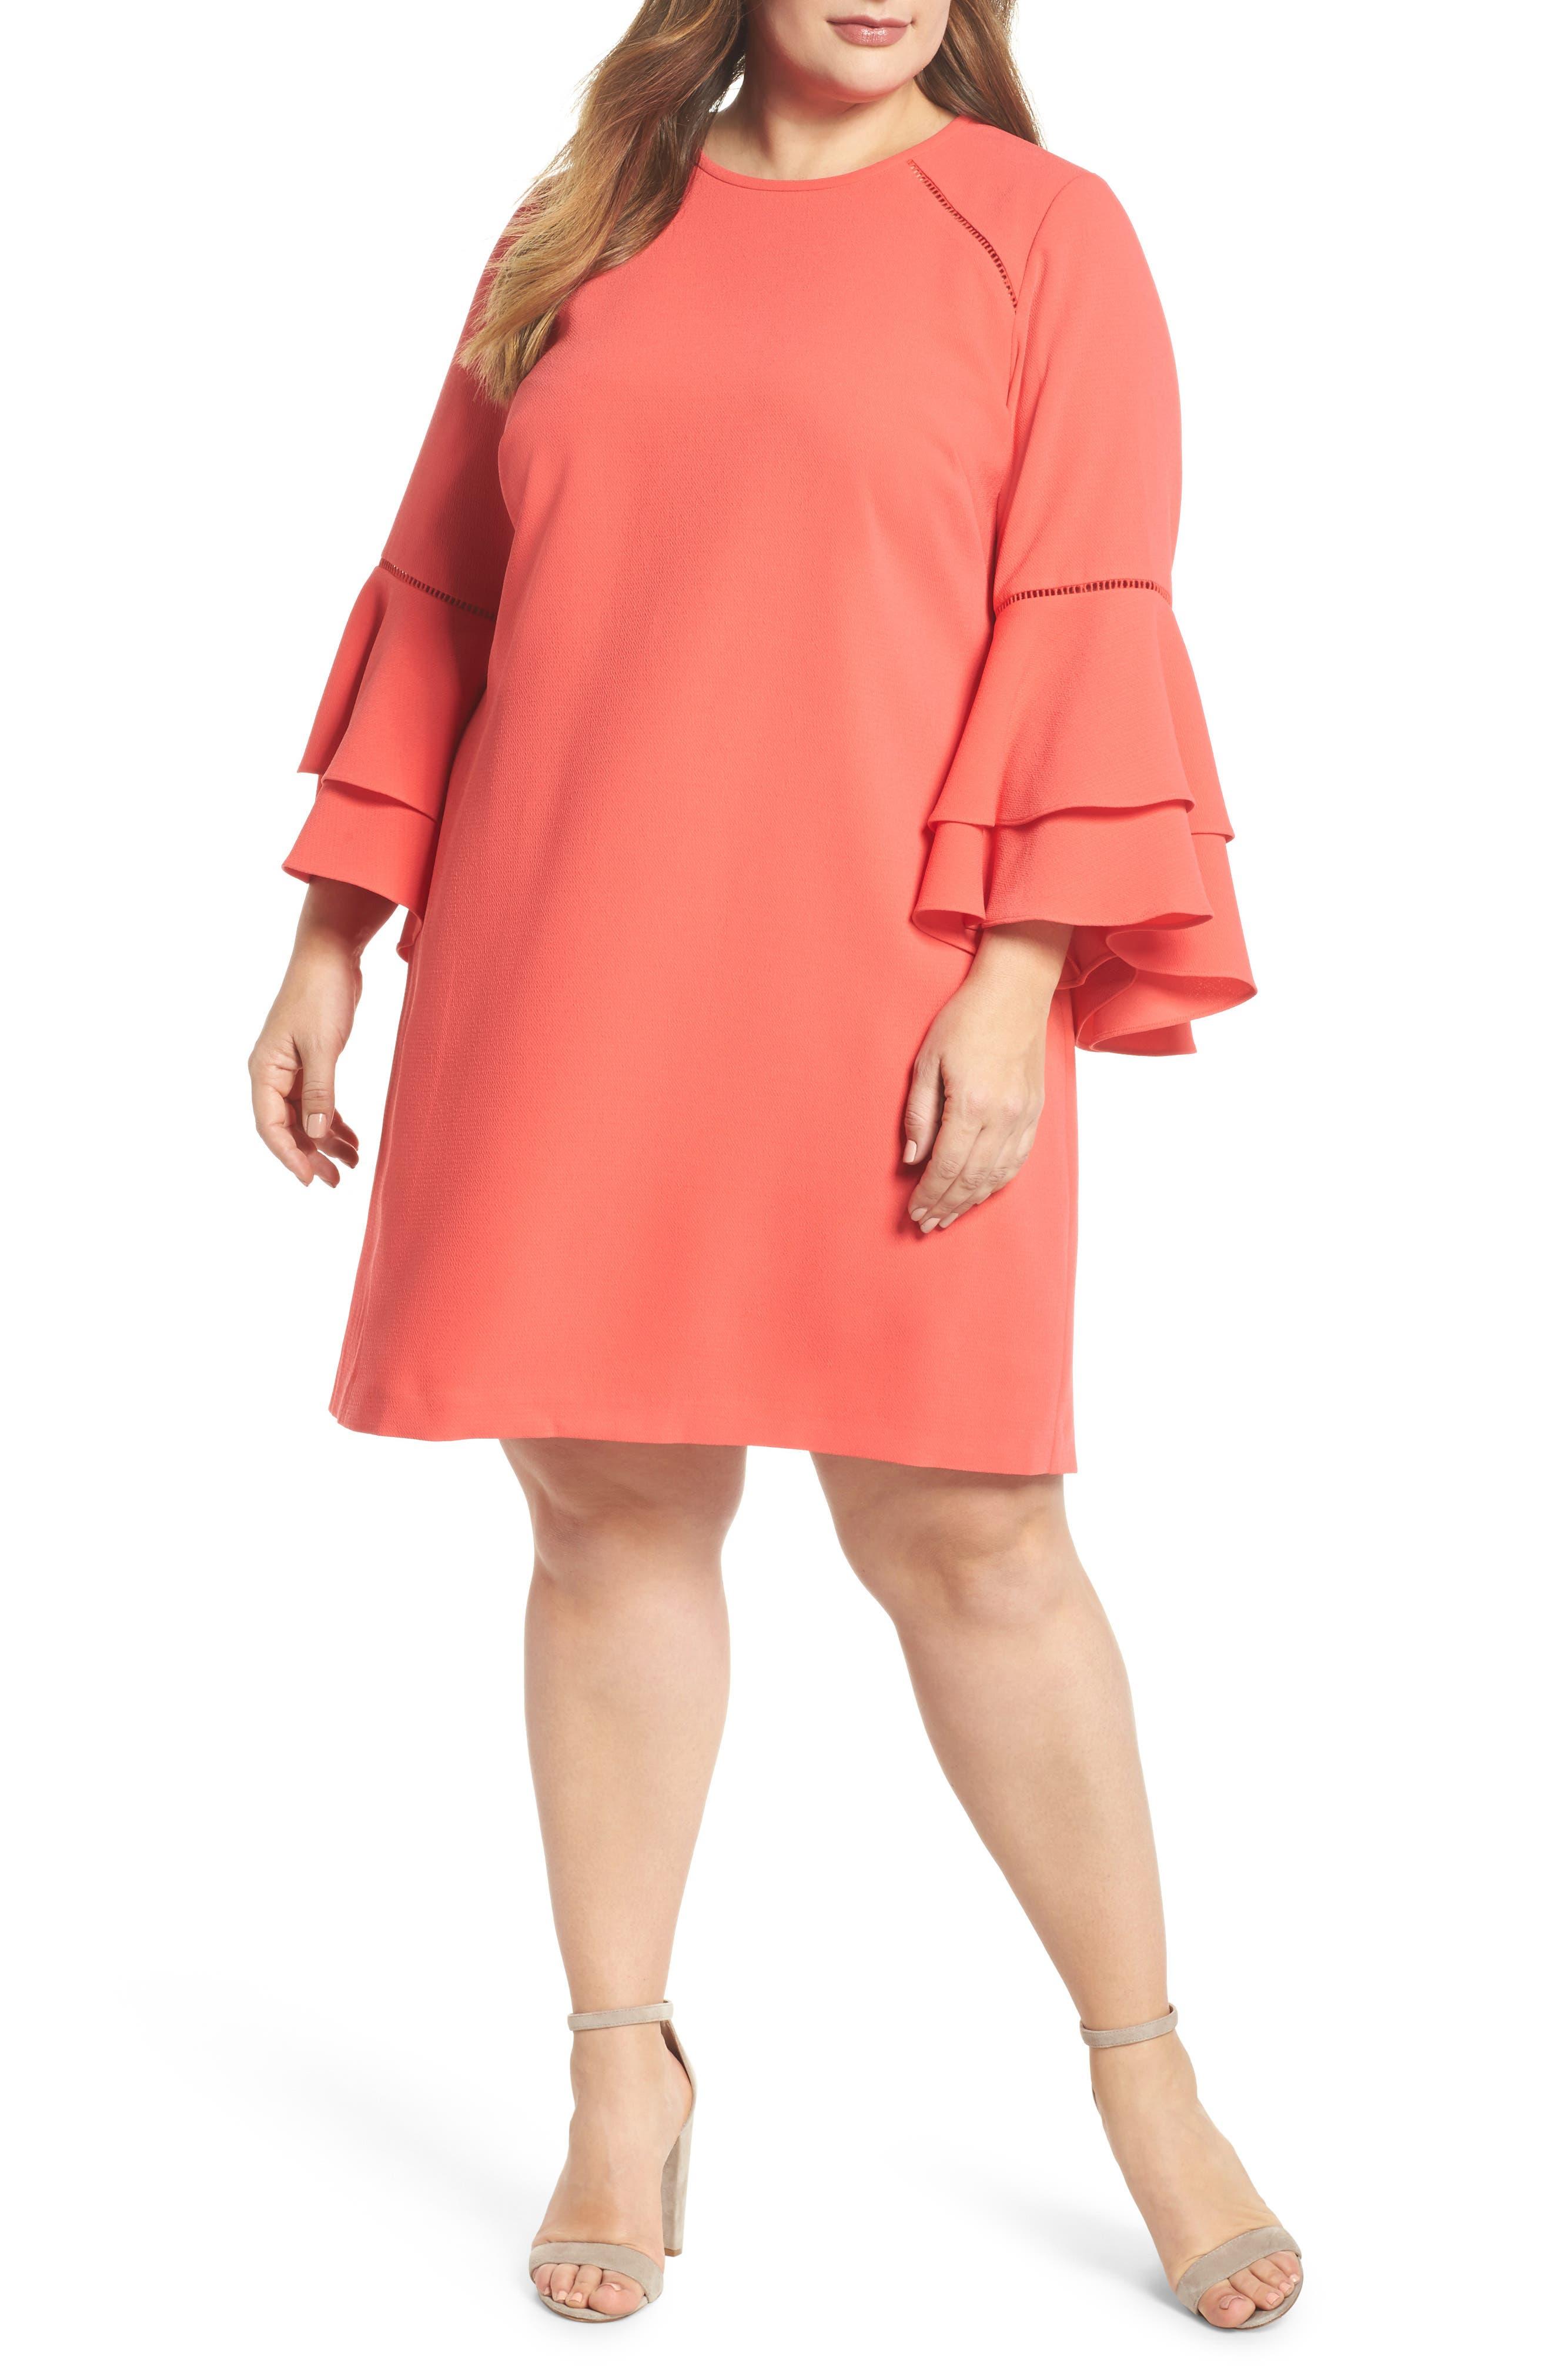 Alternate Image 1 Selected - Chelsea28 Ruffle Bell Sleeve Shift Dress (Plus Size)